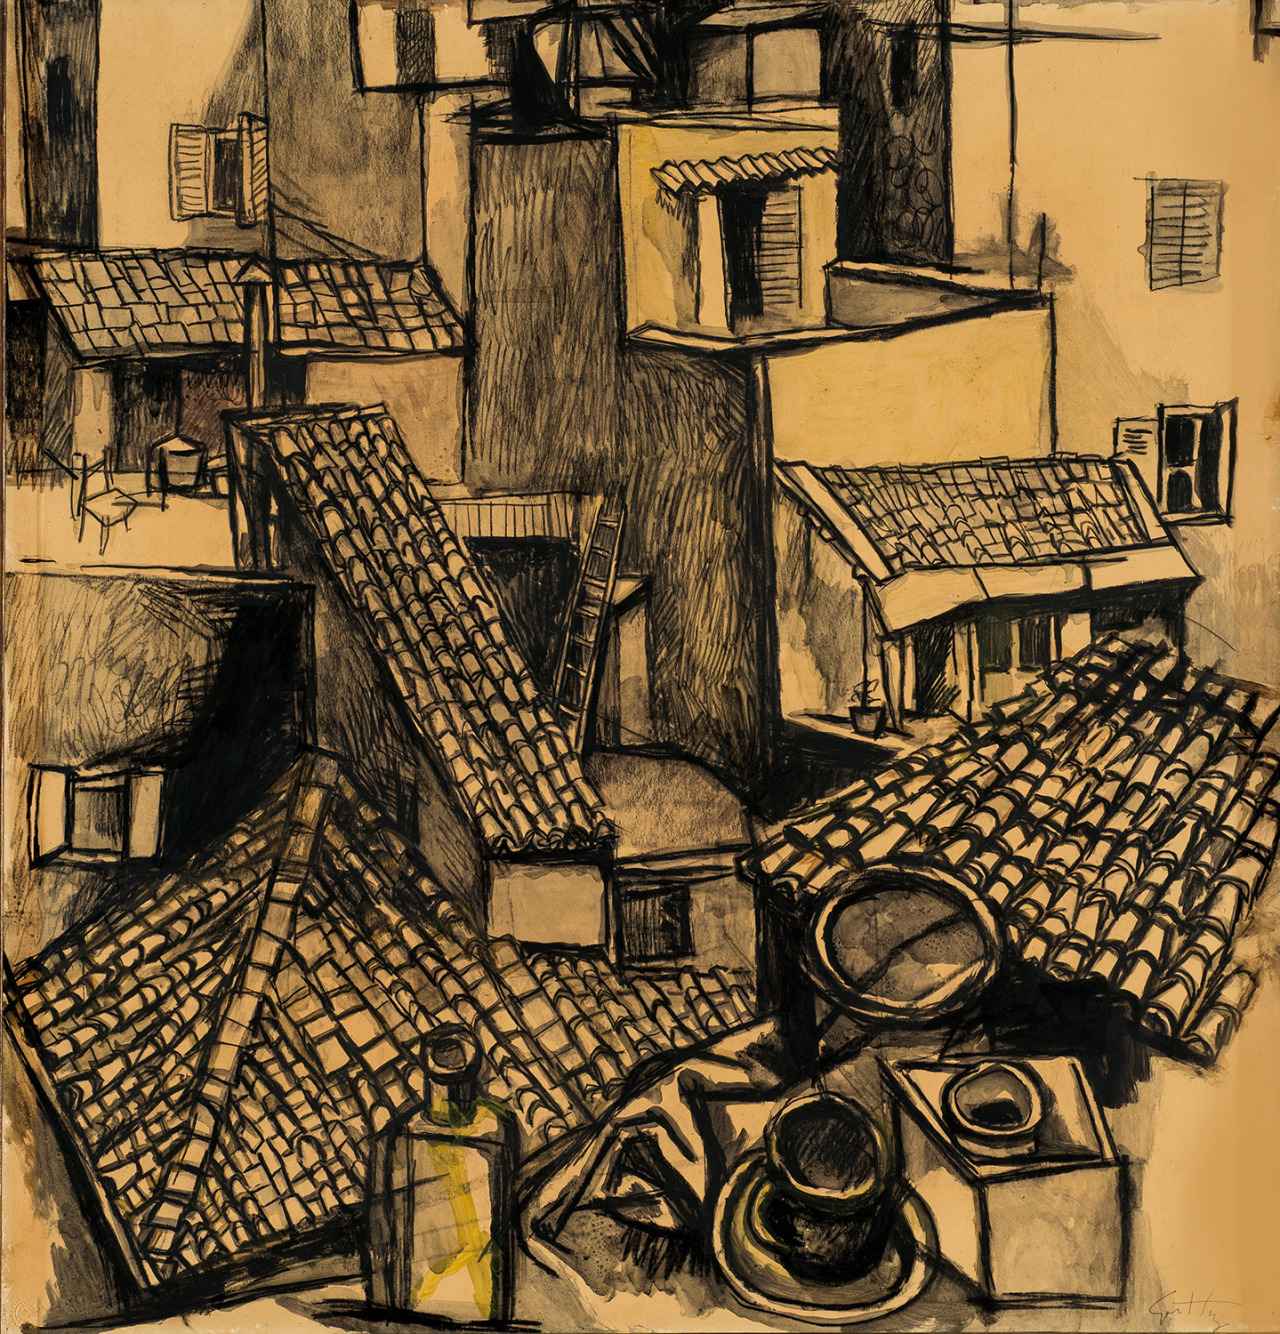 "thunderstruck9:"" Renato Guttuso (Italian, 1911-1987), Tetti di Roma [Roofs of Rome], 1961. Pencil and watercolour on paper laid on canvas, 77 x 74 cm."""